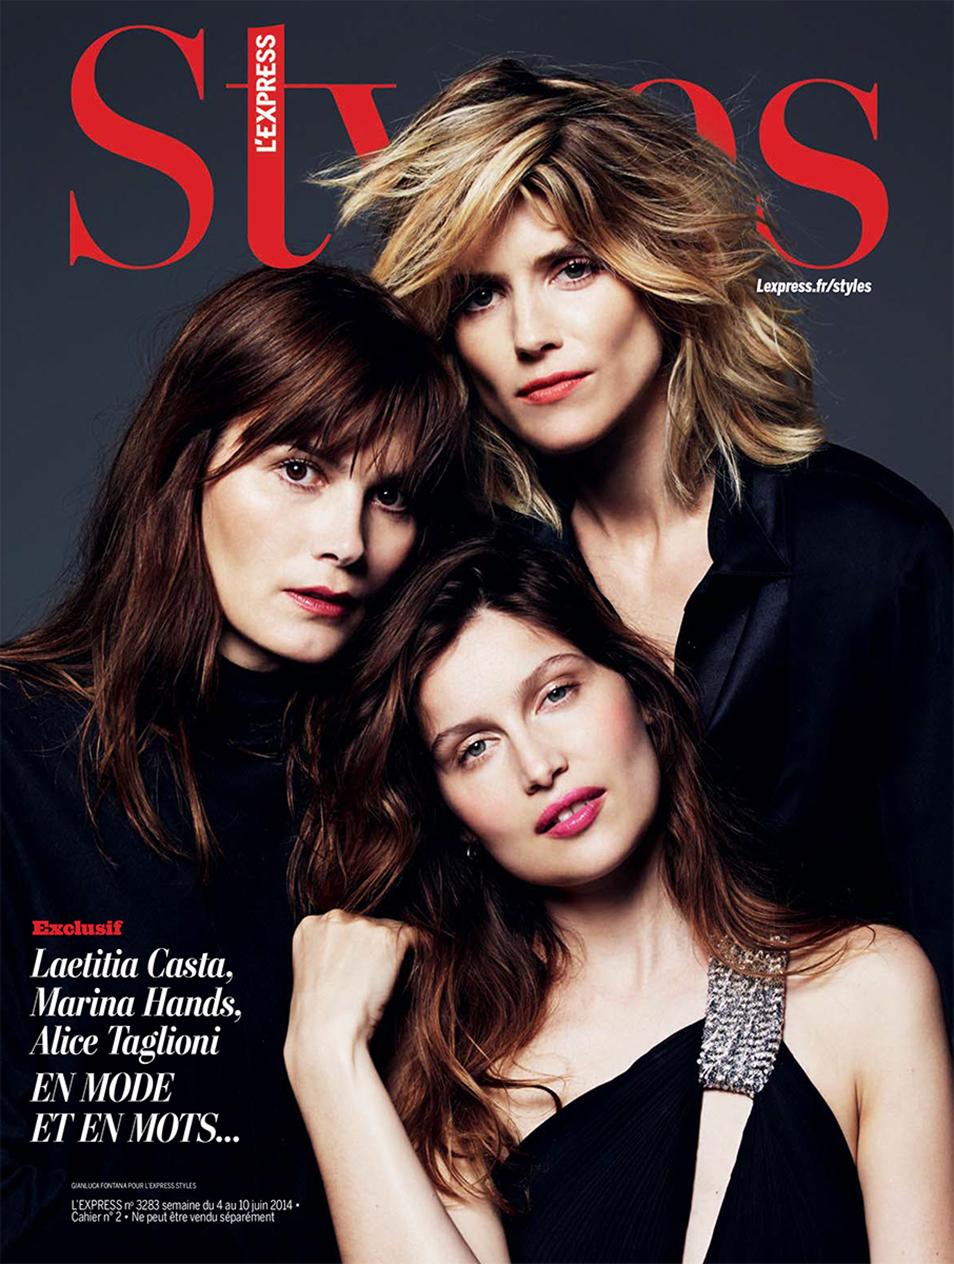 Laetitia Casta,Marina Hands, Alice Taglioni -  L'Express Styles